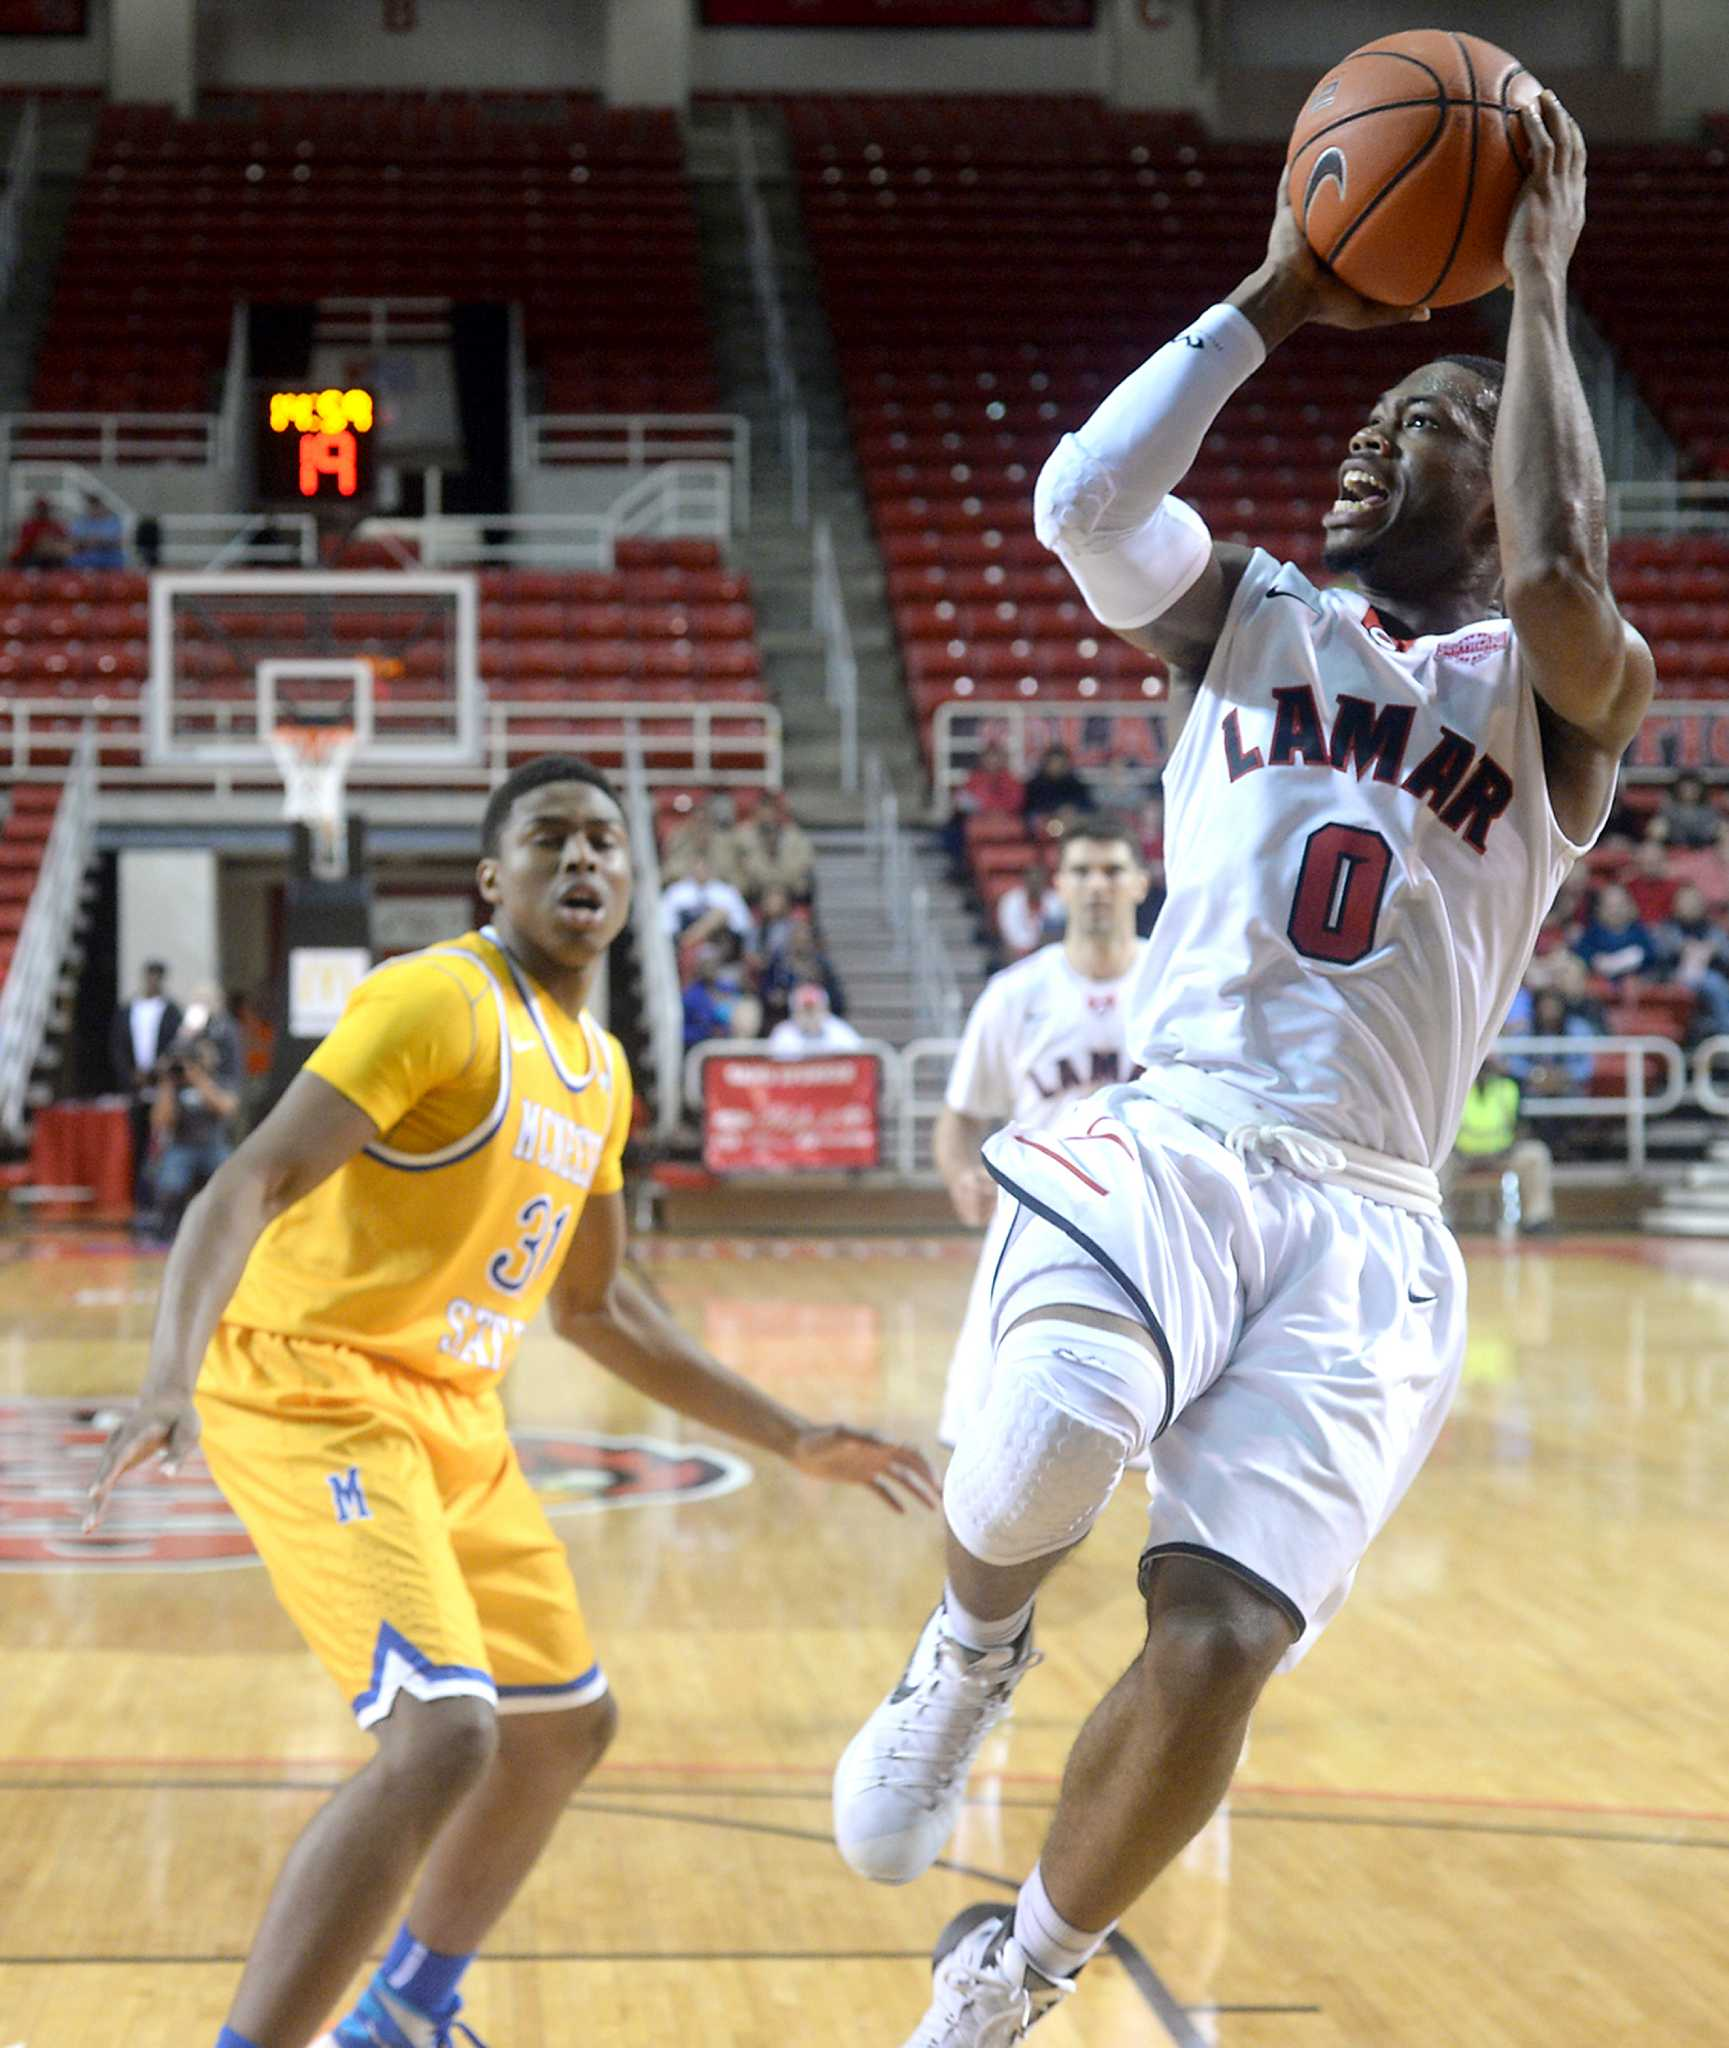 Shooting In Lamar Colorado: Lamar Adjusts Basketball Lineup As 3 Players Depart Team